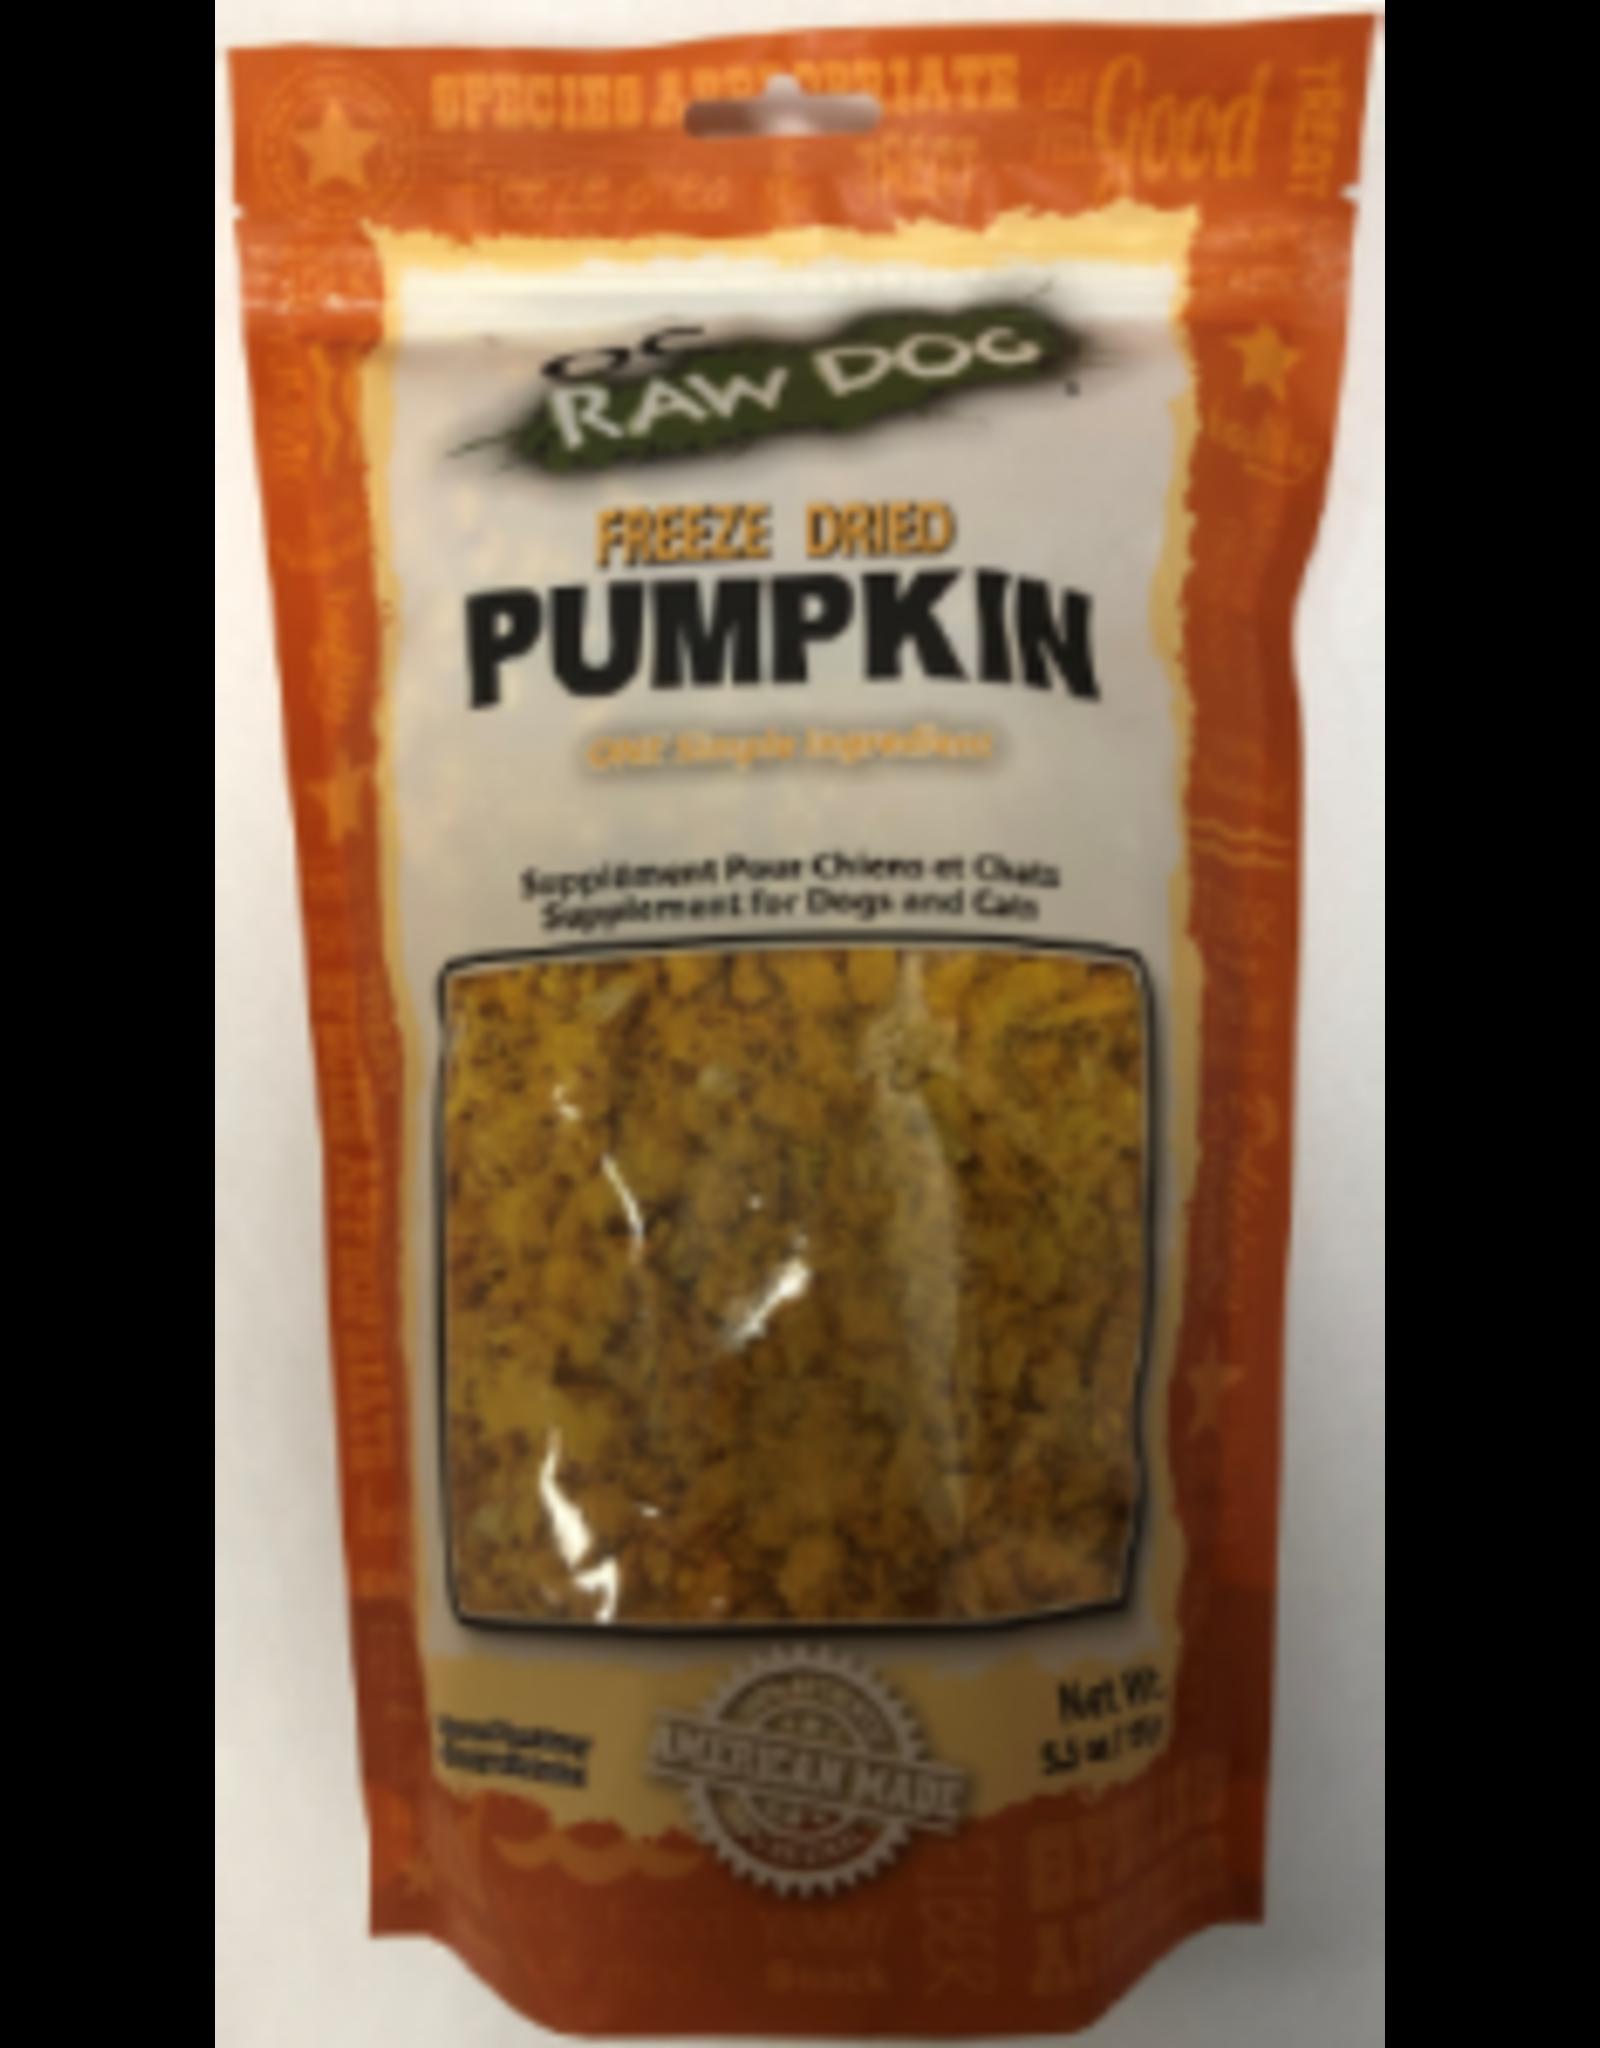 OC Raw Dog OC Raw Dog Freeze Dried Pumpkin 5.5oz